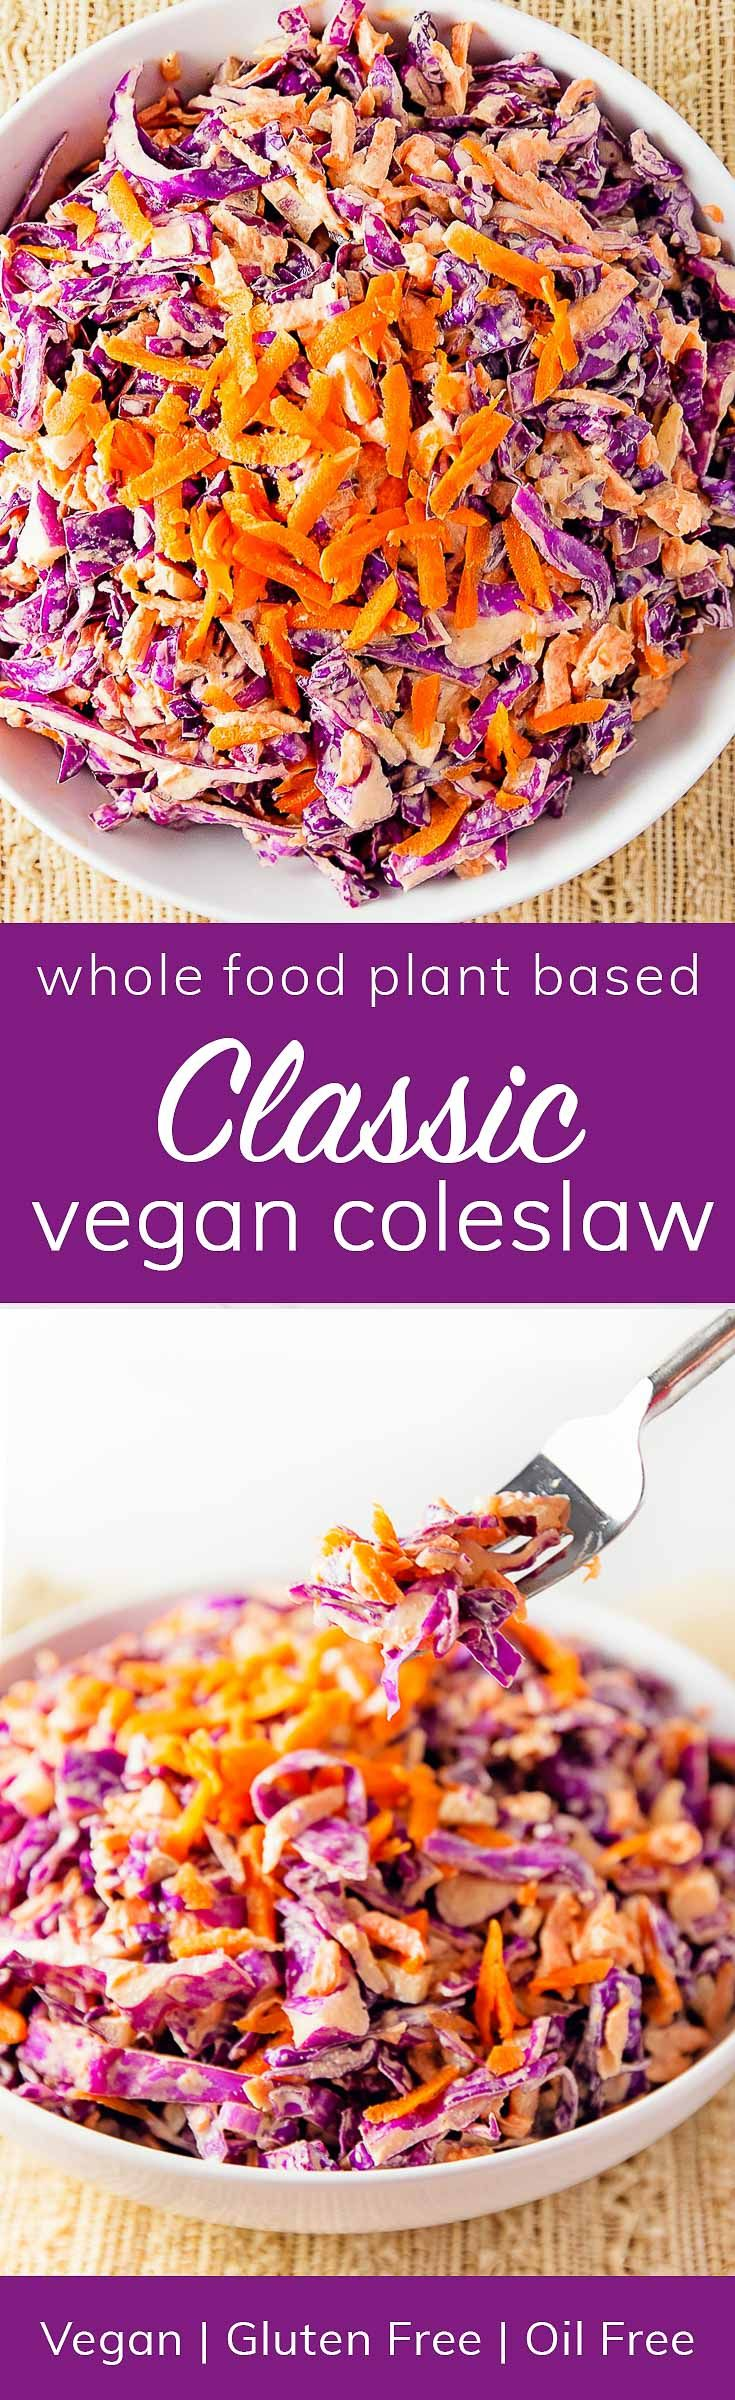 Classic Vegan Coleslaw, vegan, vegetarian, whole food plant based, gluten free, recipe, wfpb, healthy, oil free, no refined sugar, no oil, refined sugar free, dinner, side, side dish, dairy free